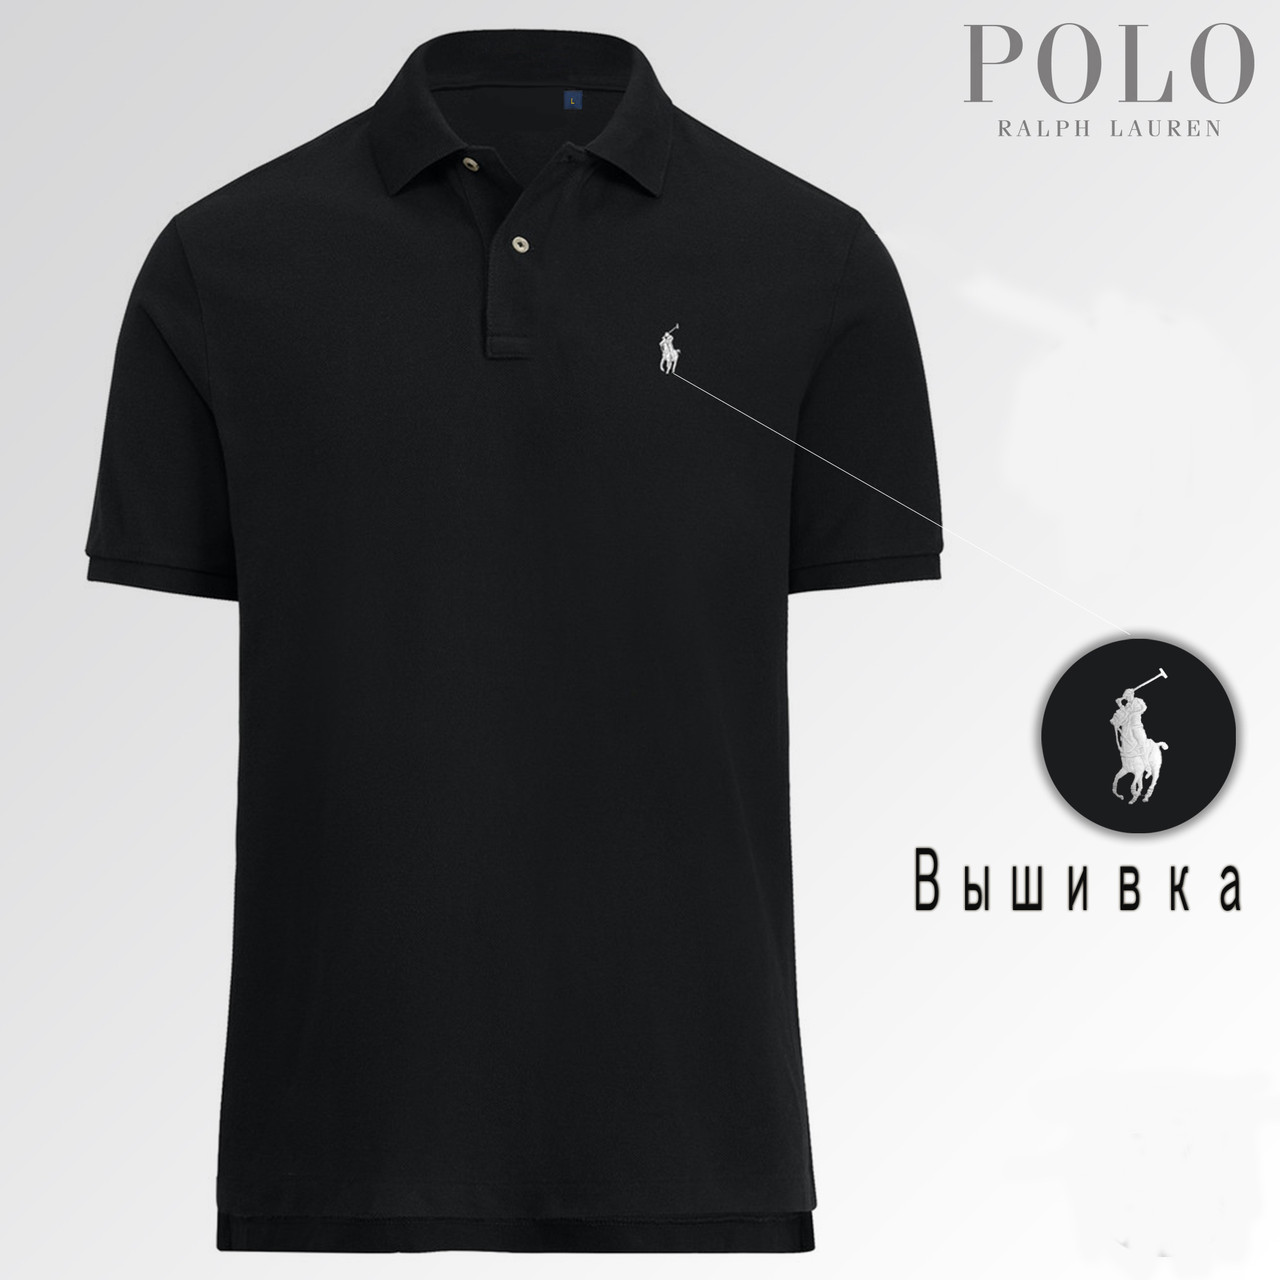 Футболка Ralph Lauren POLO черная вышивка логотип реплика , фото 1